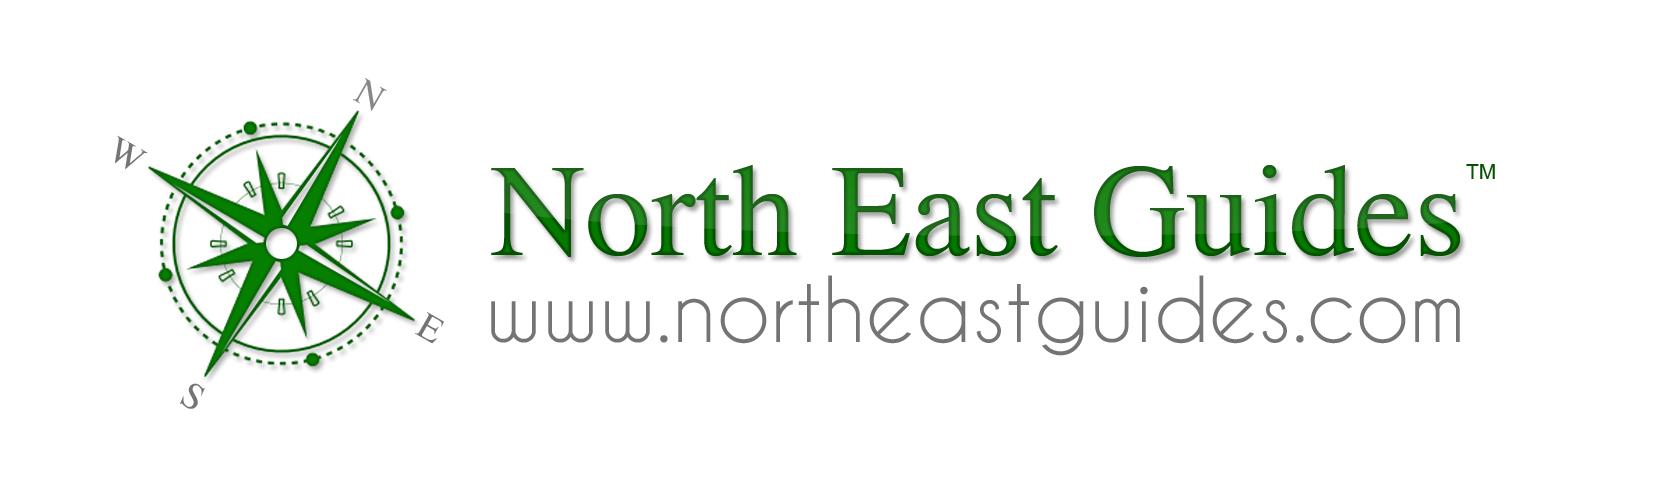 http://www.northeastguides.com/